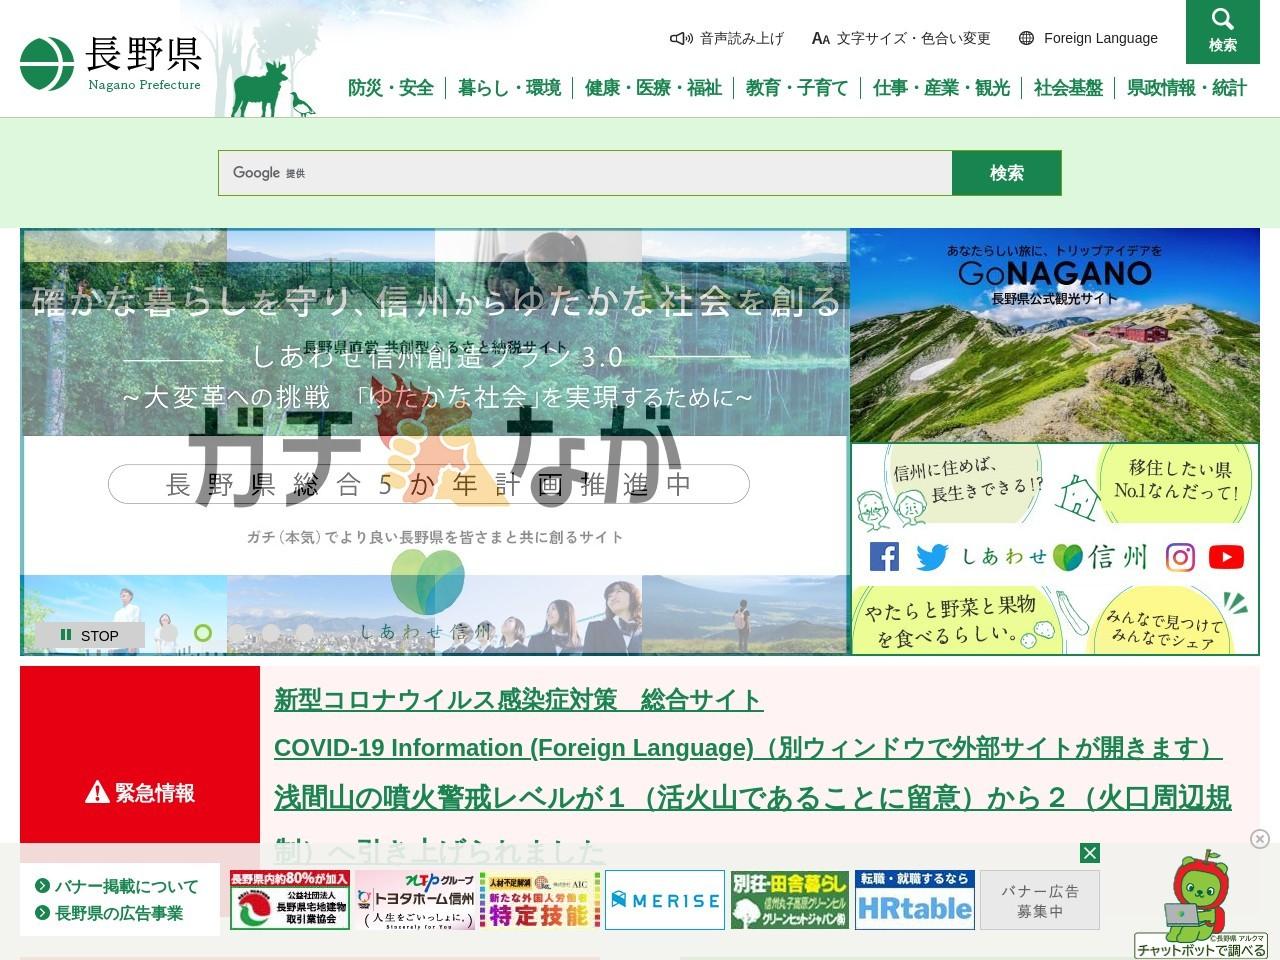 http://www.pref.nagano.lg.jp/kisochi/kisochi-seisaku/